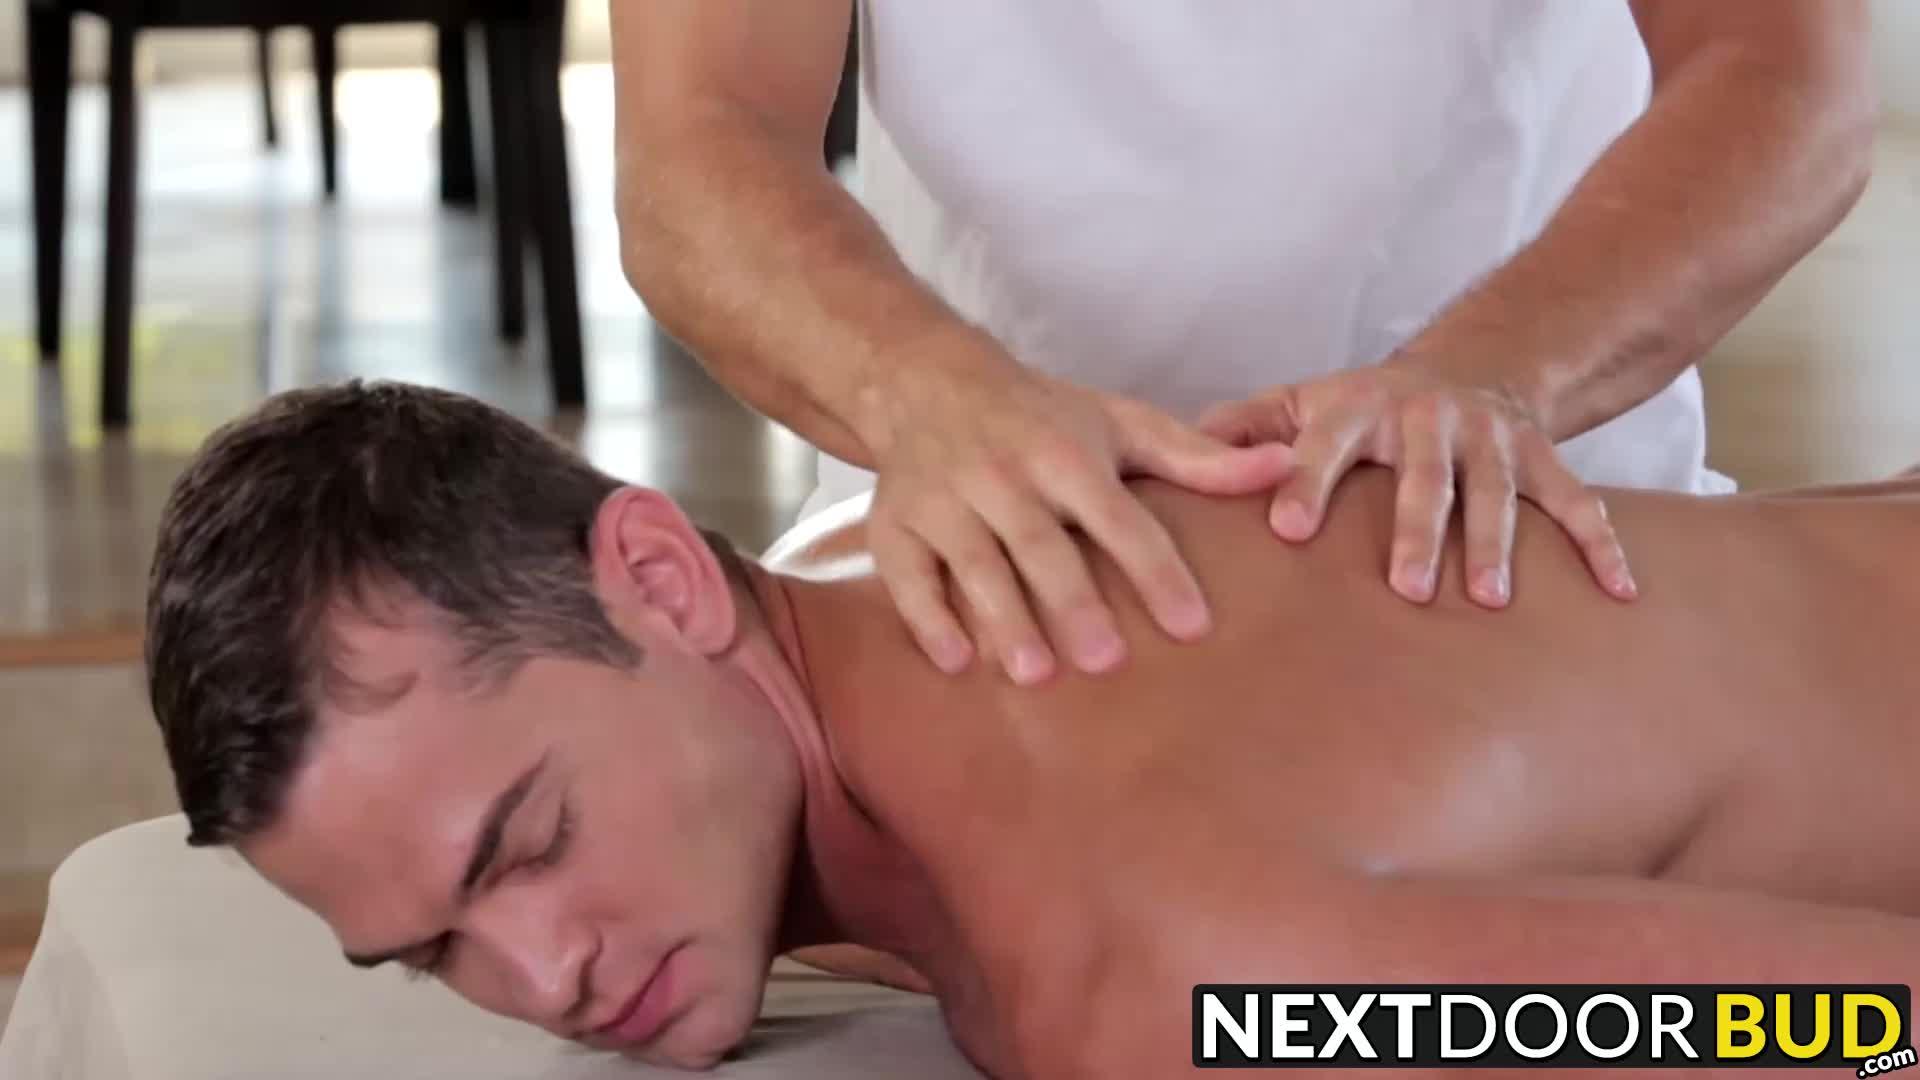 Секс массаж hd смотреть онлайн верно!